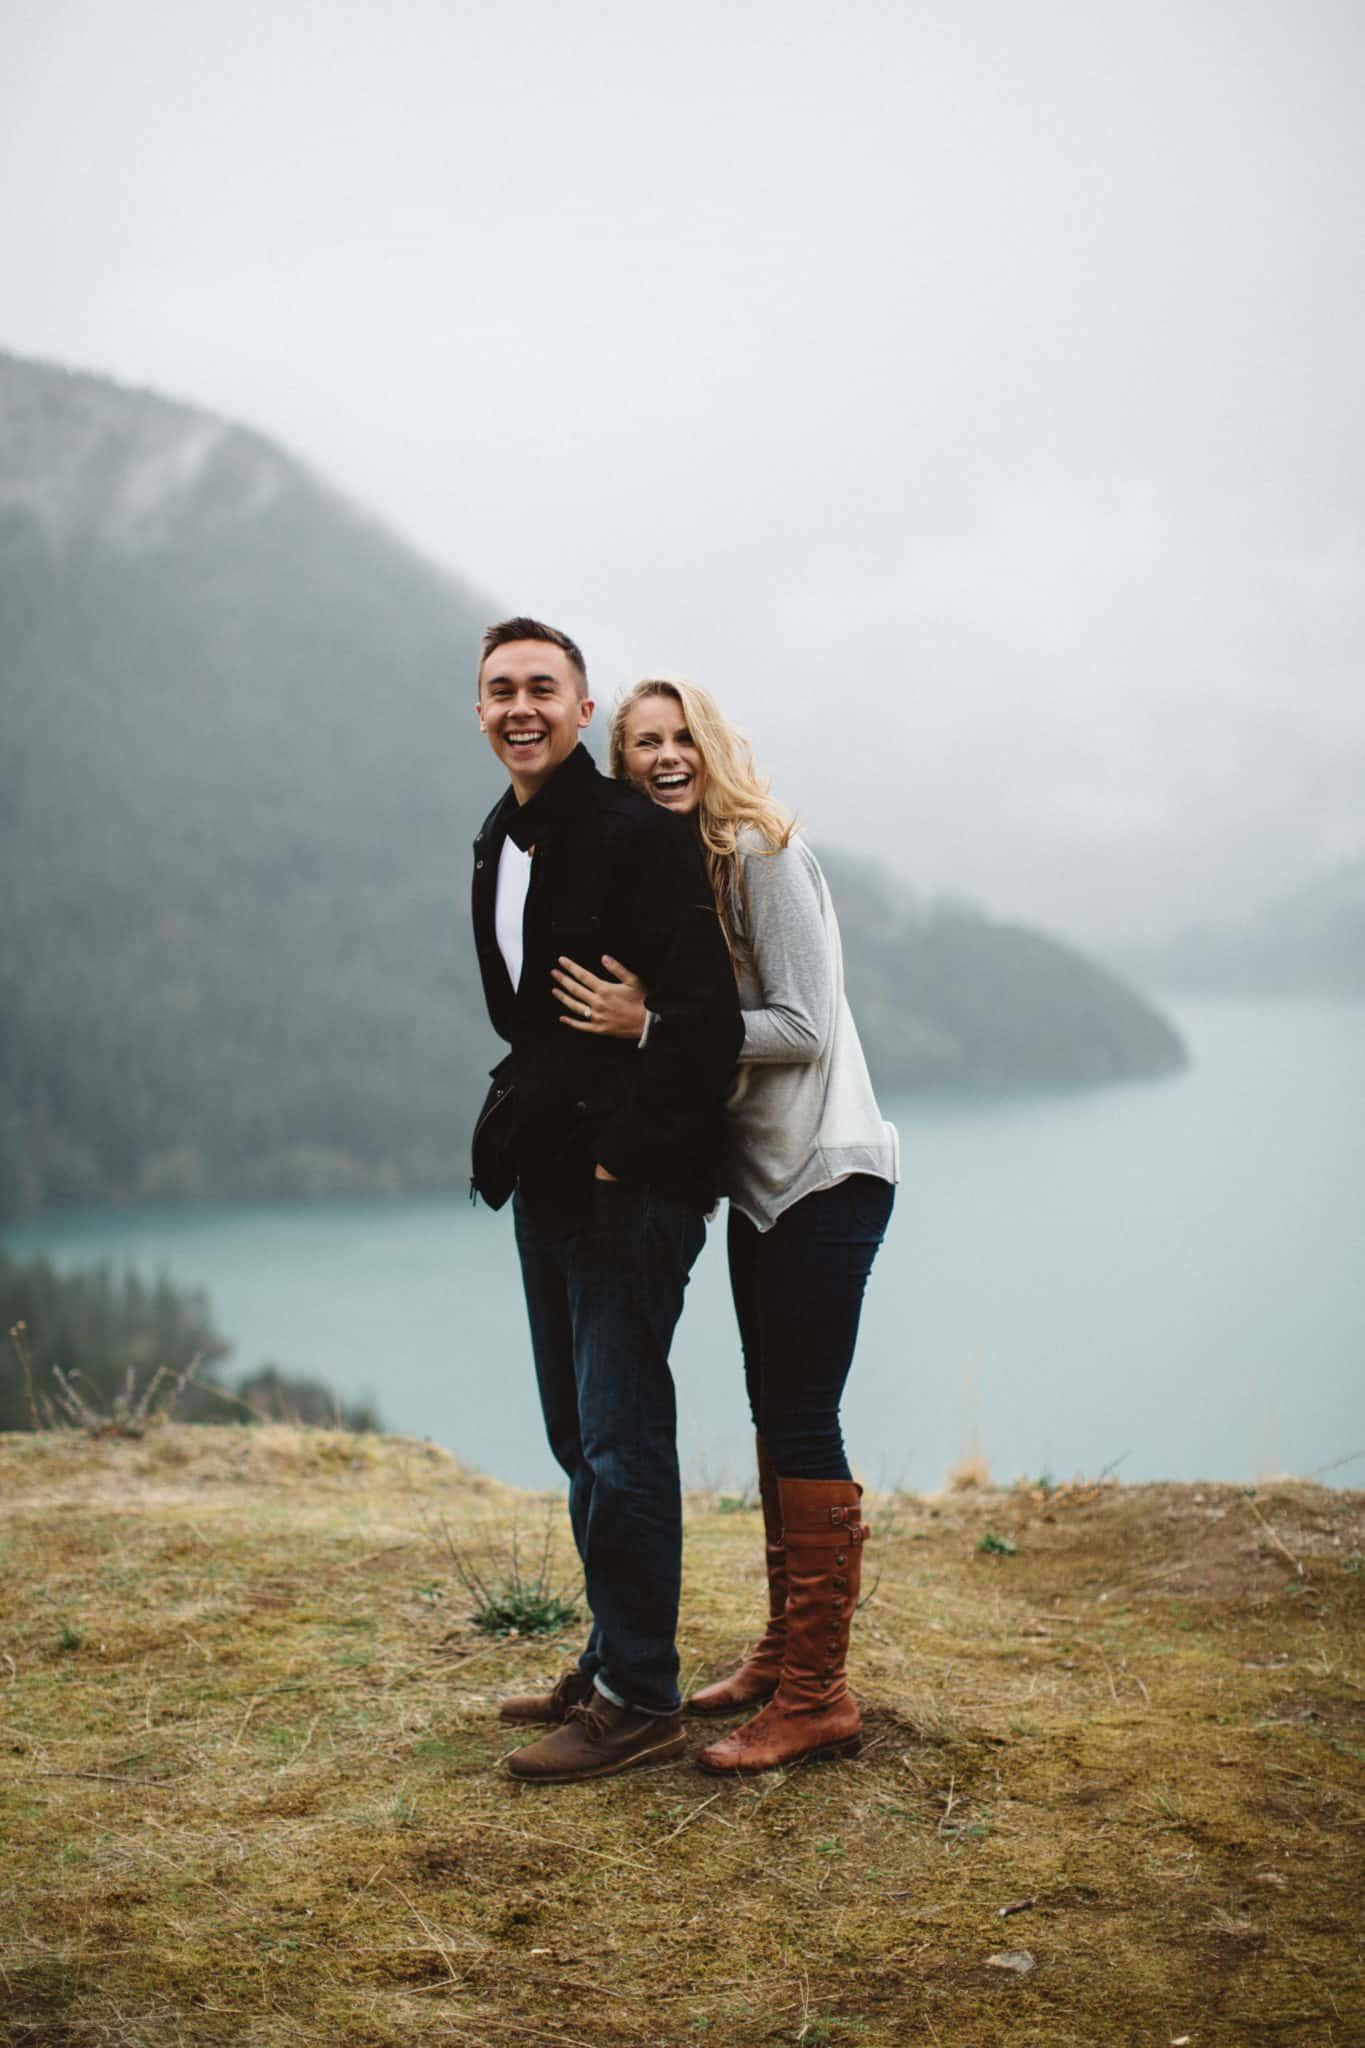 Diablo Lake - PNW Engagement shoot locations - TheMandagies.com